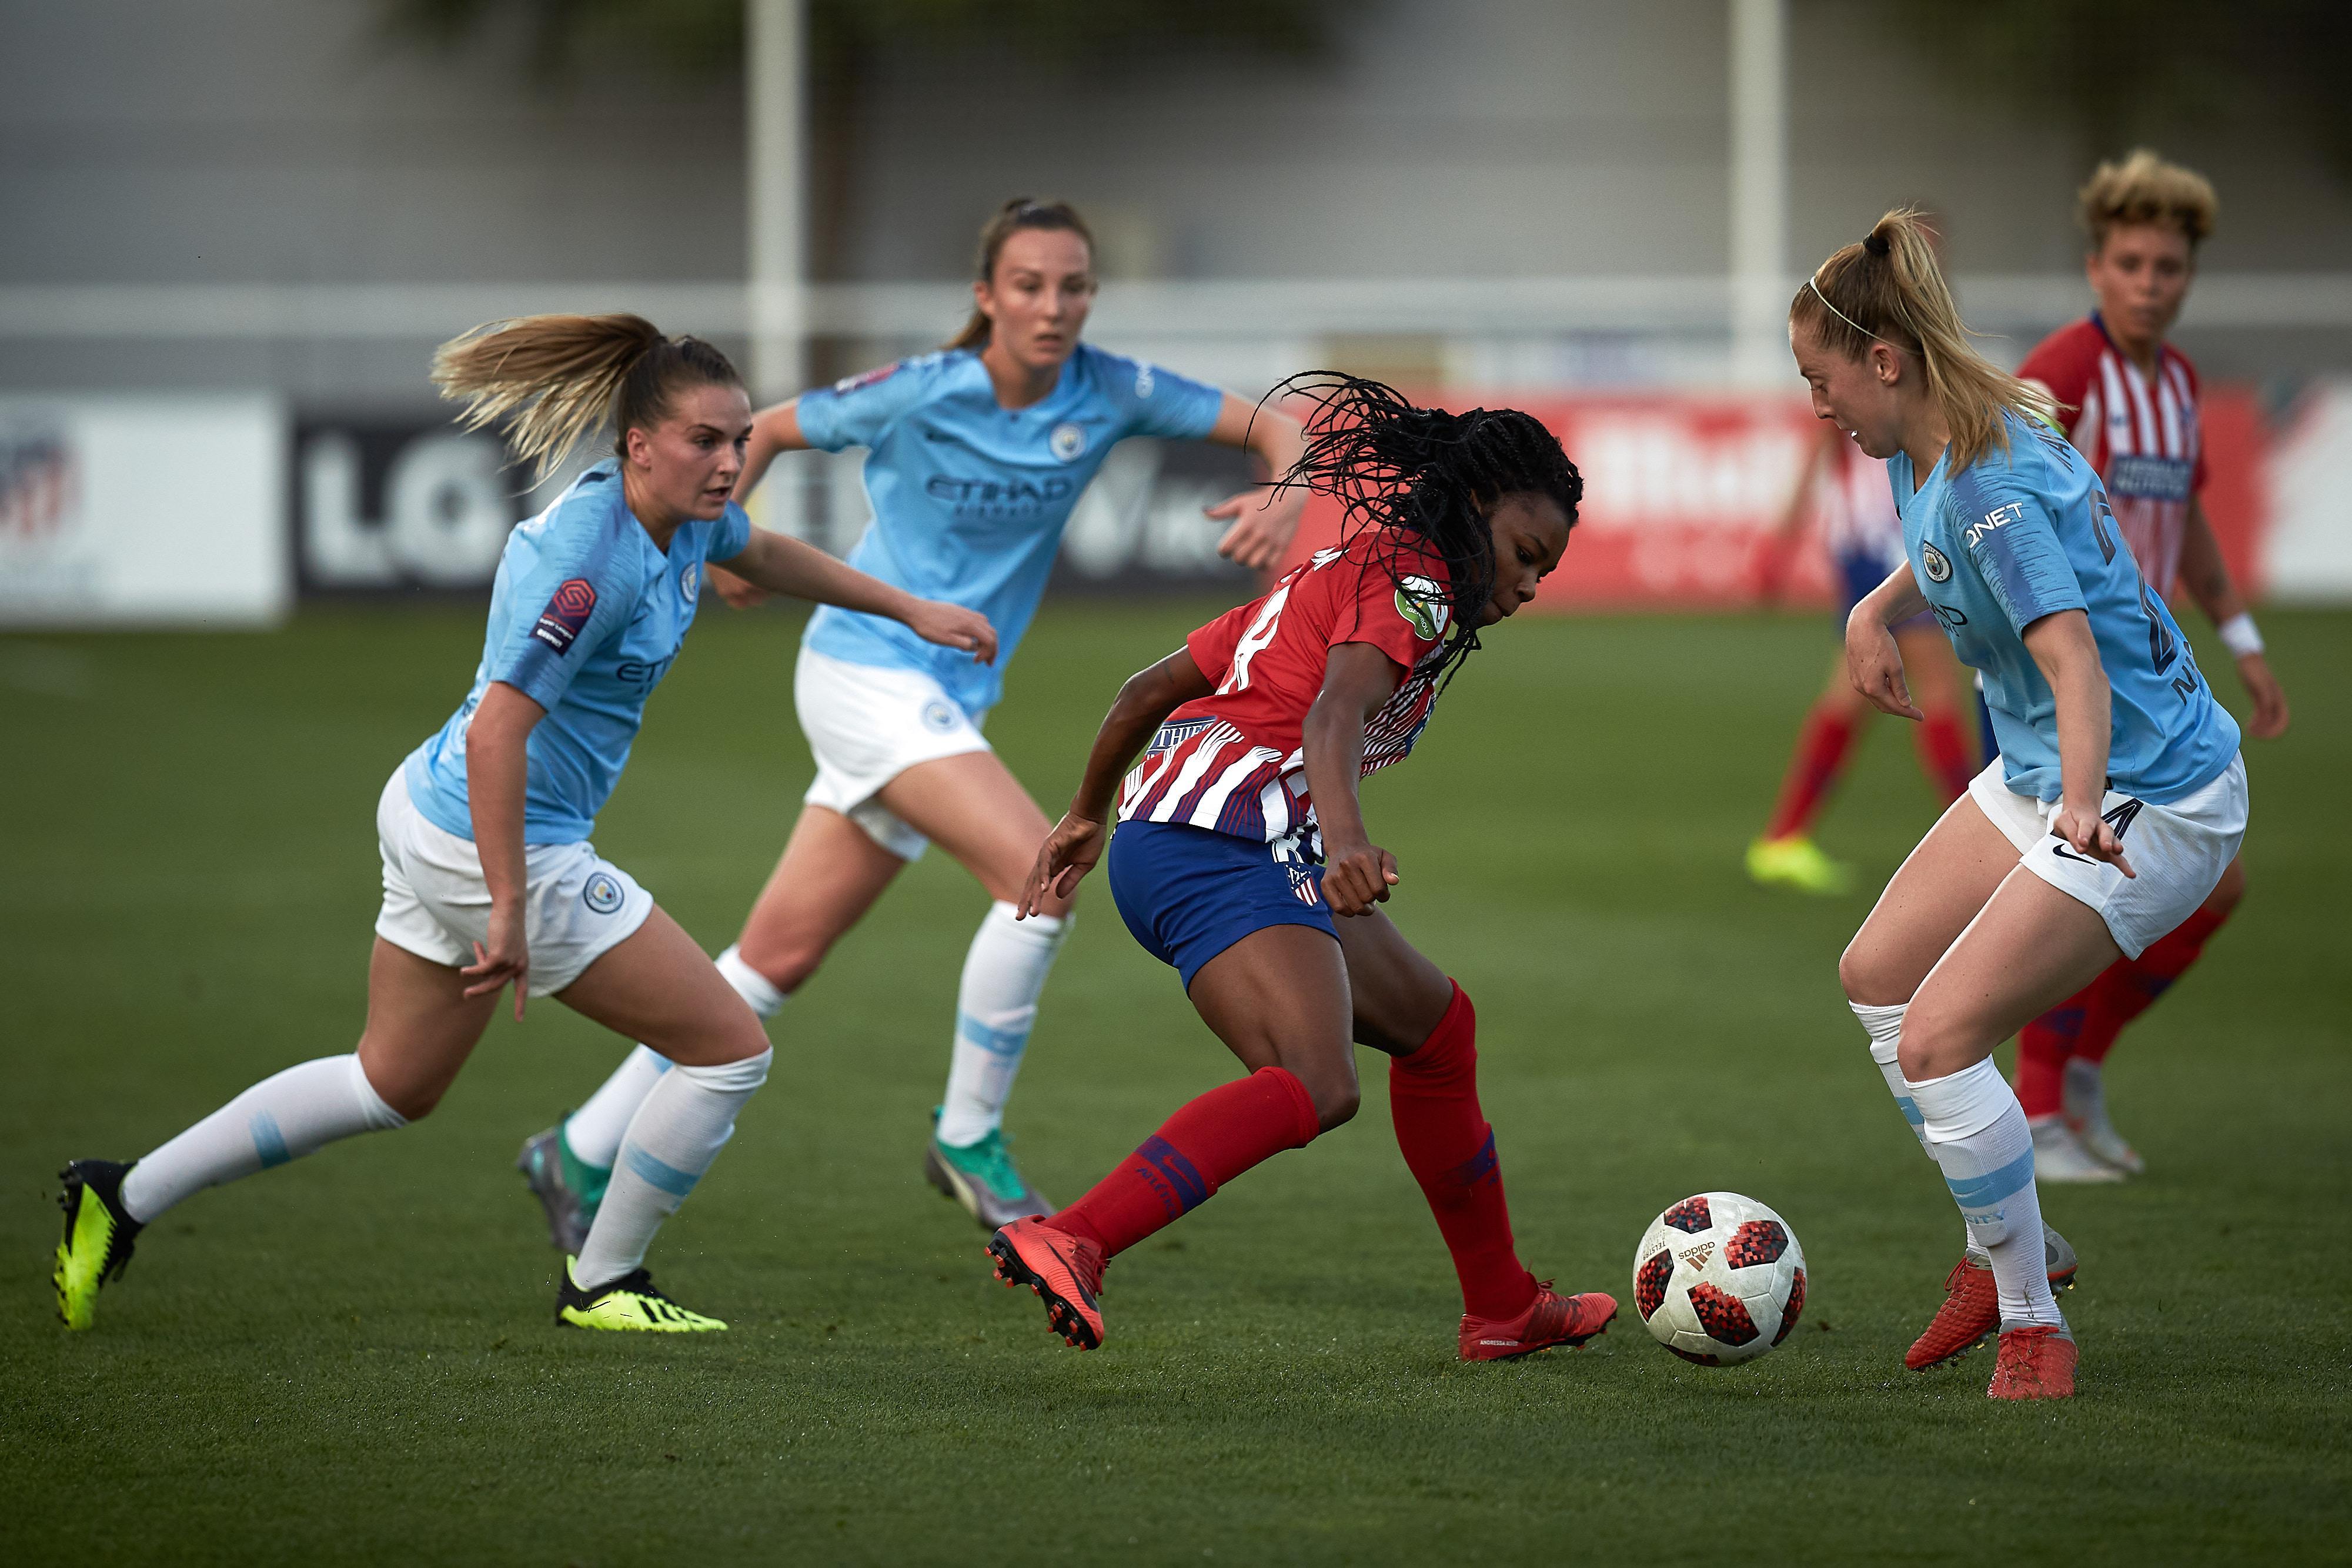 Ludmila Da Silva takes on Manchester City's Gemma Bonner